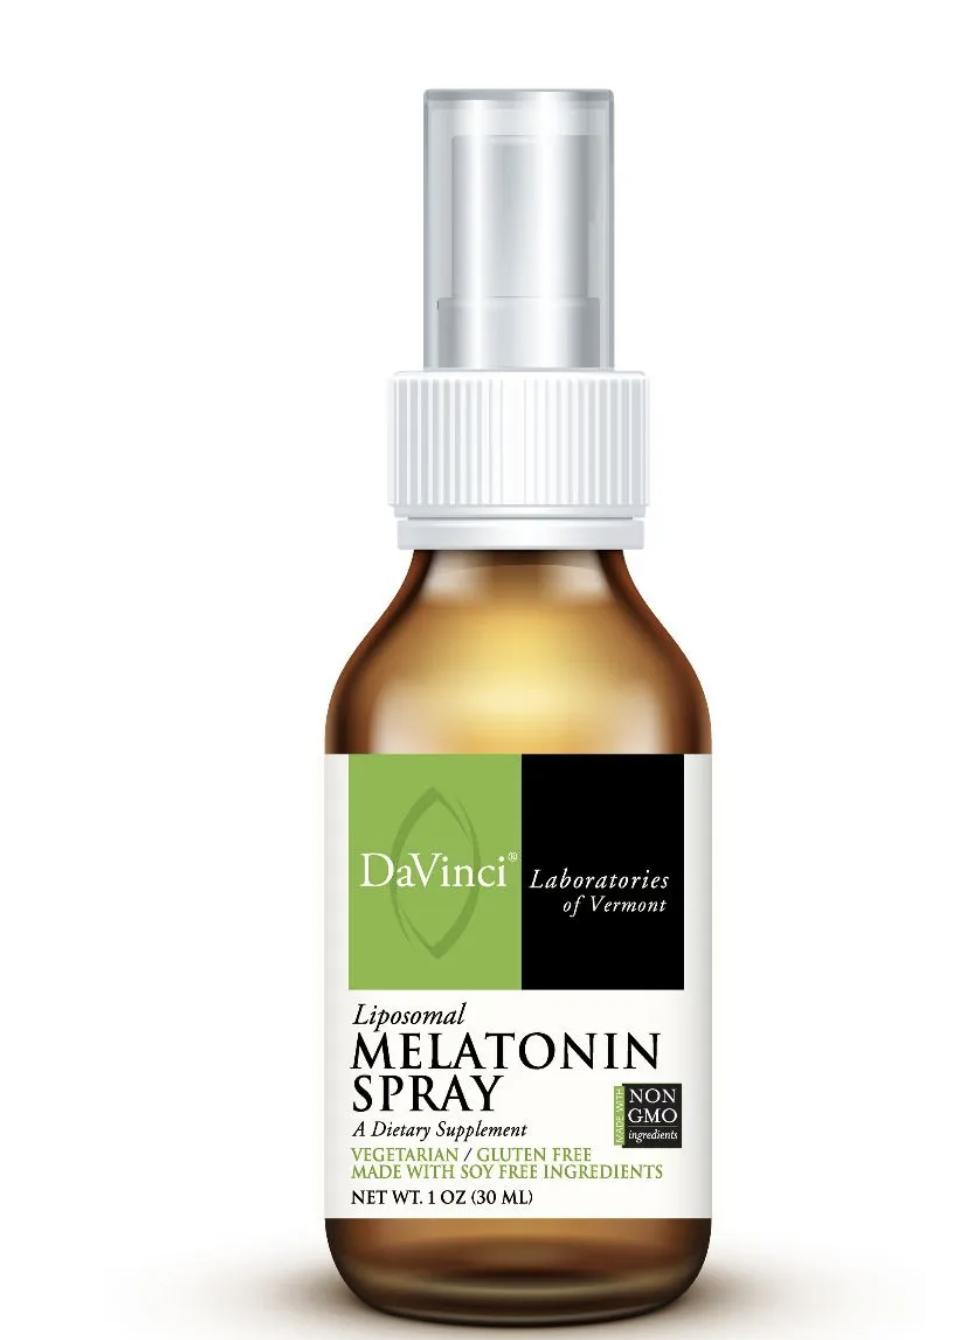 LIPOSOMAL MELATONIN SPRAY 3 mg 30 ml DaVinci Laboratories